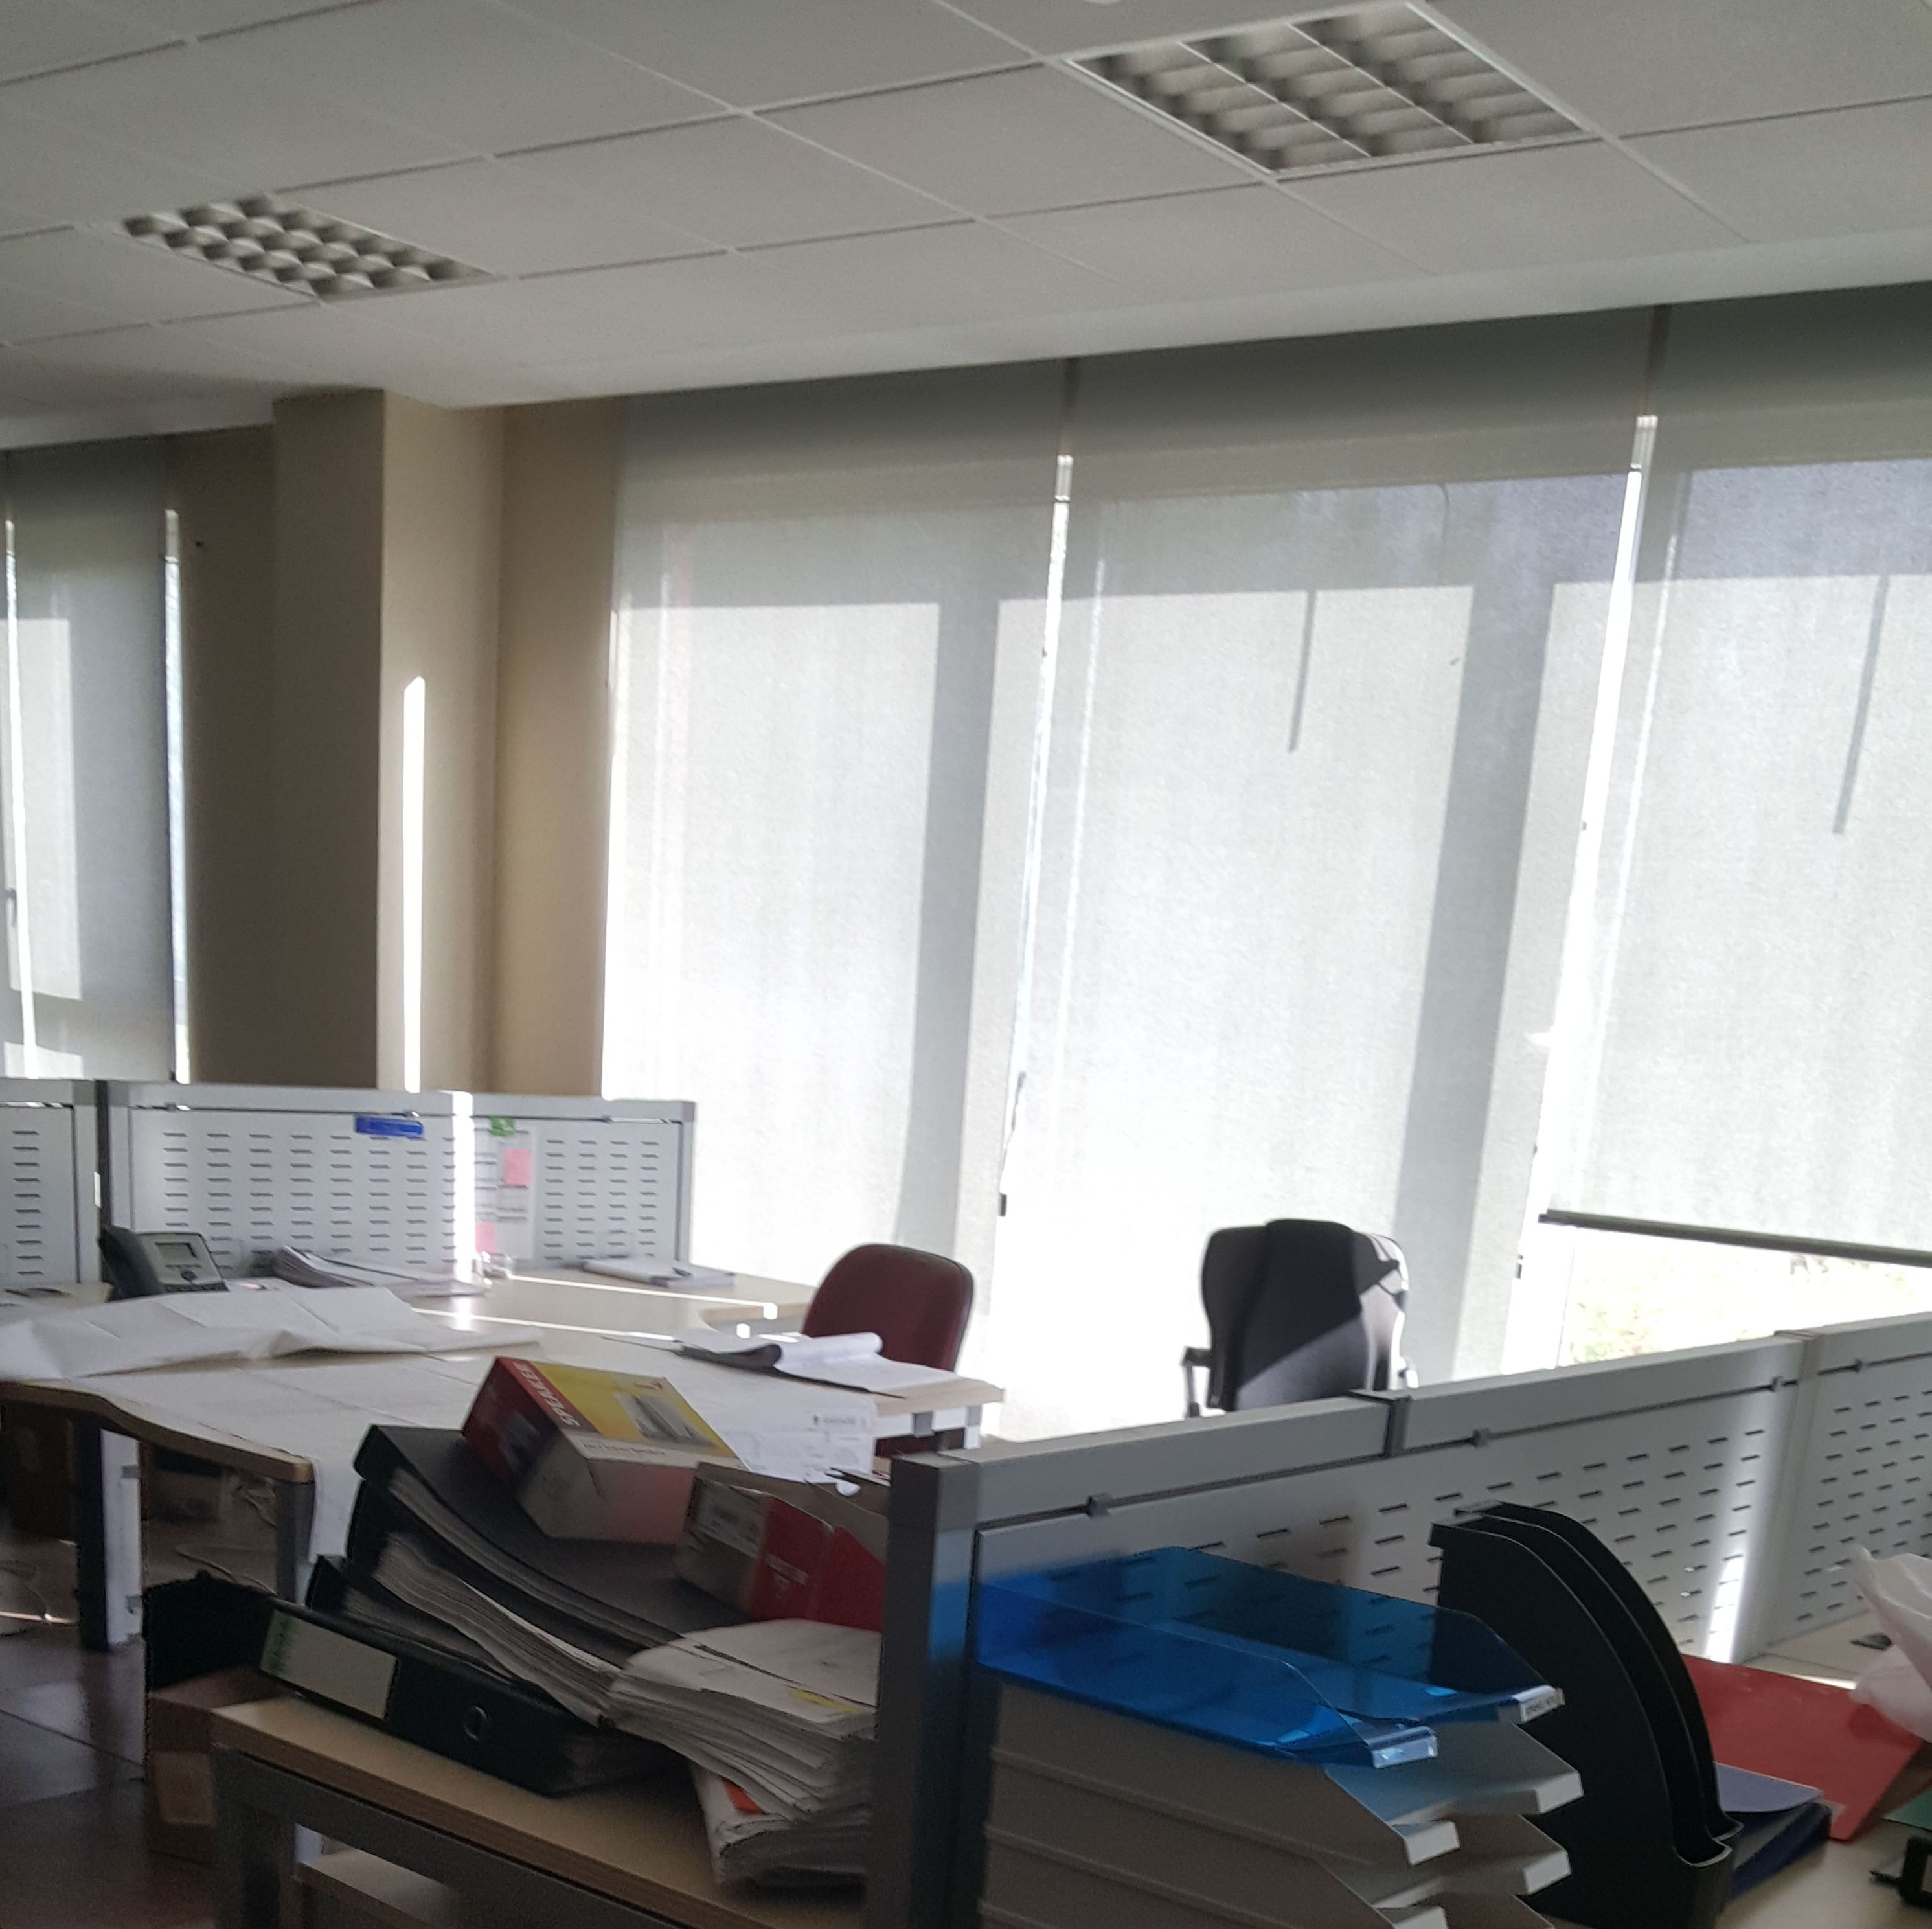 Foto 11 de Empresas de limpieza en BASOZABAL | Limpiezas La Fragua